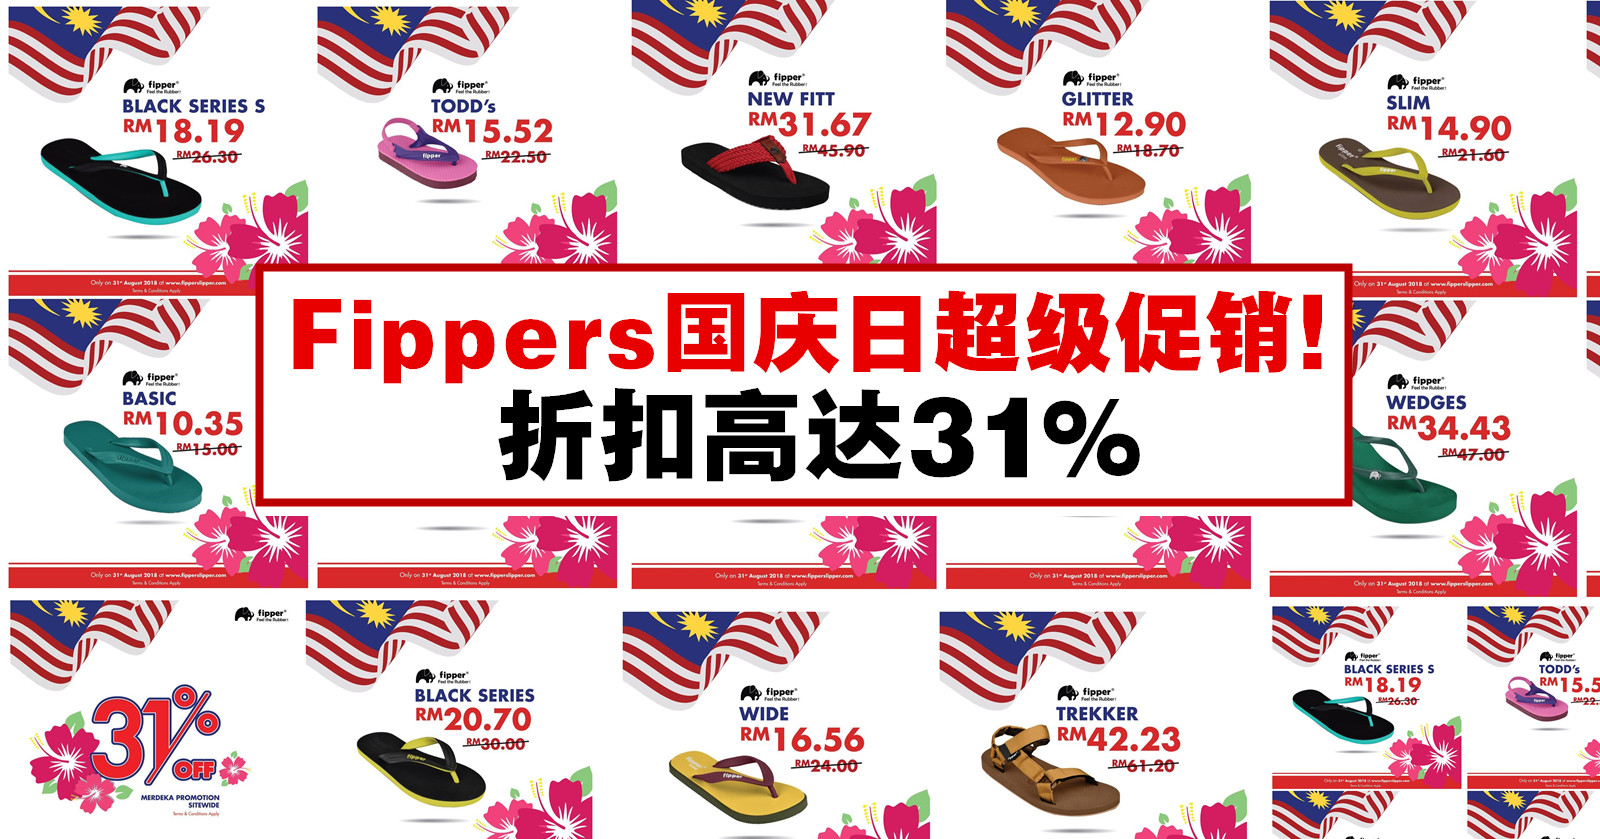 Fippers国庆日超级促销!折扣31%